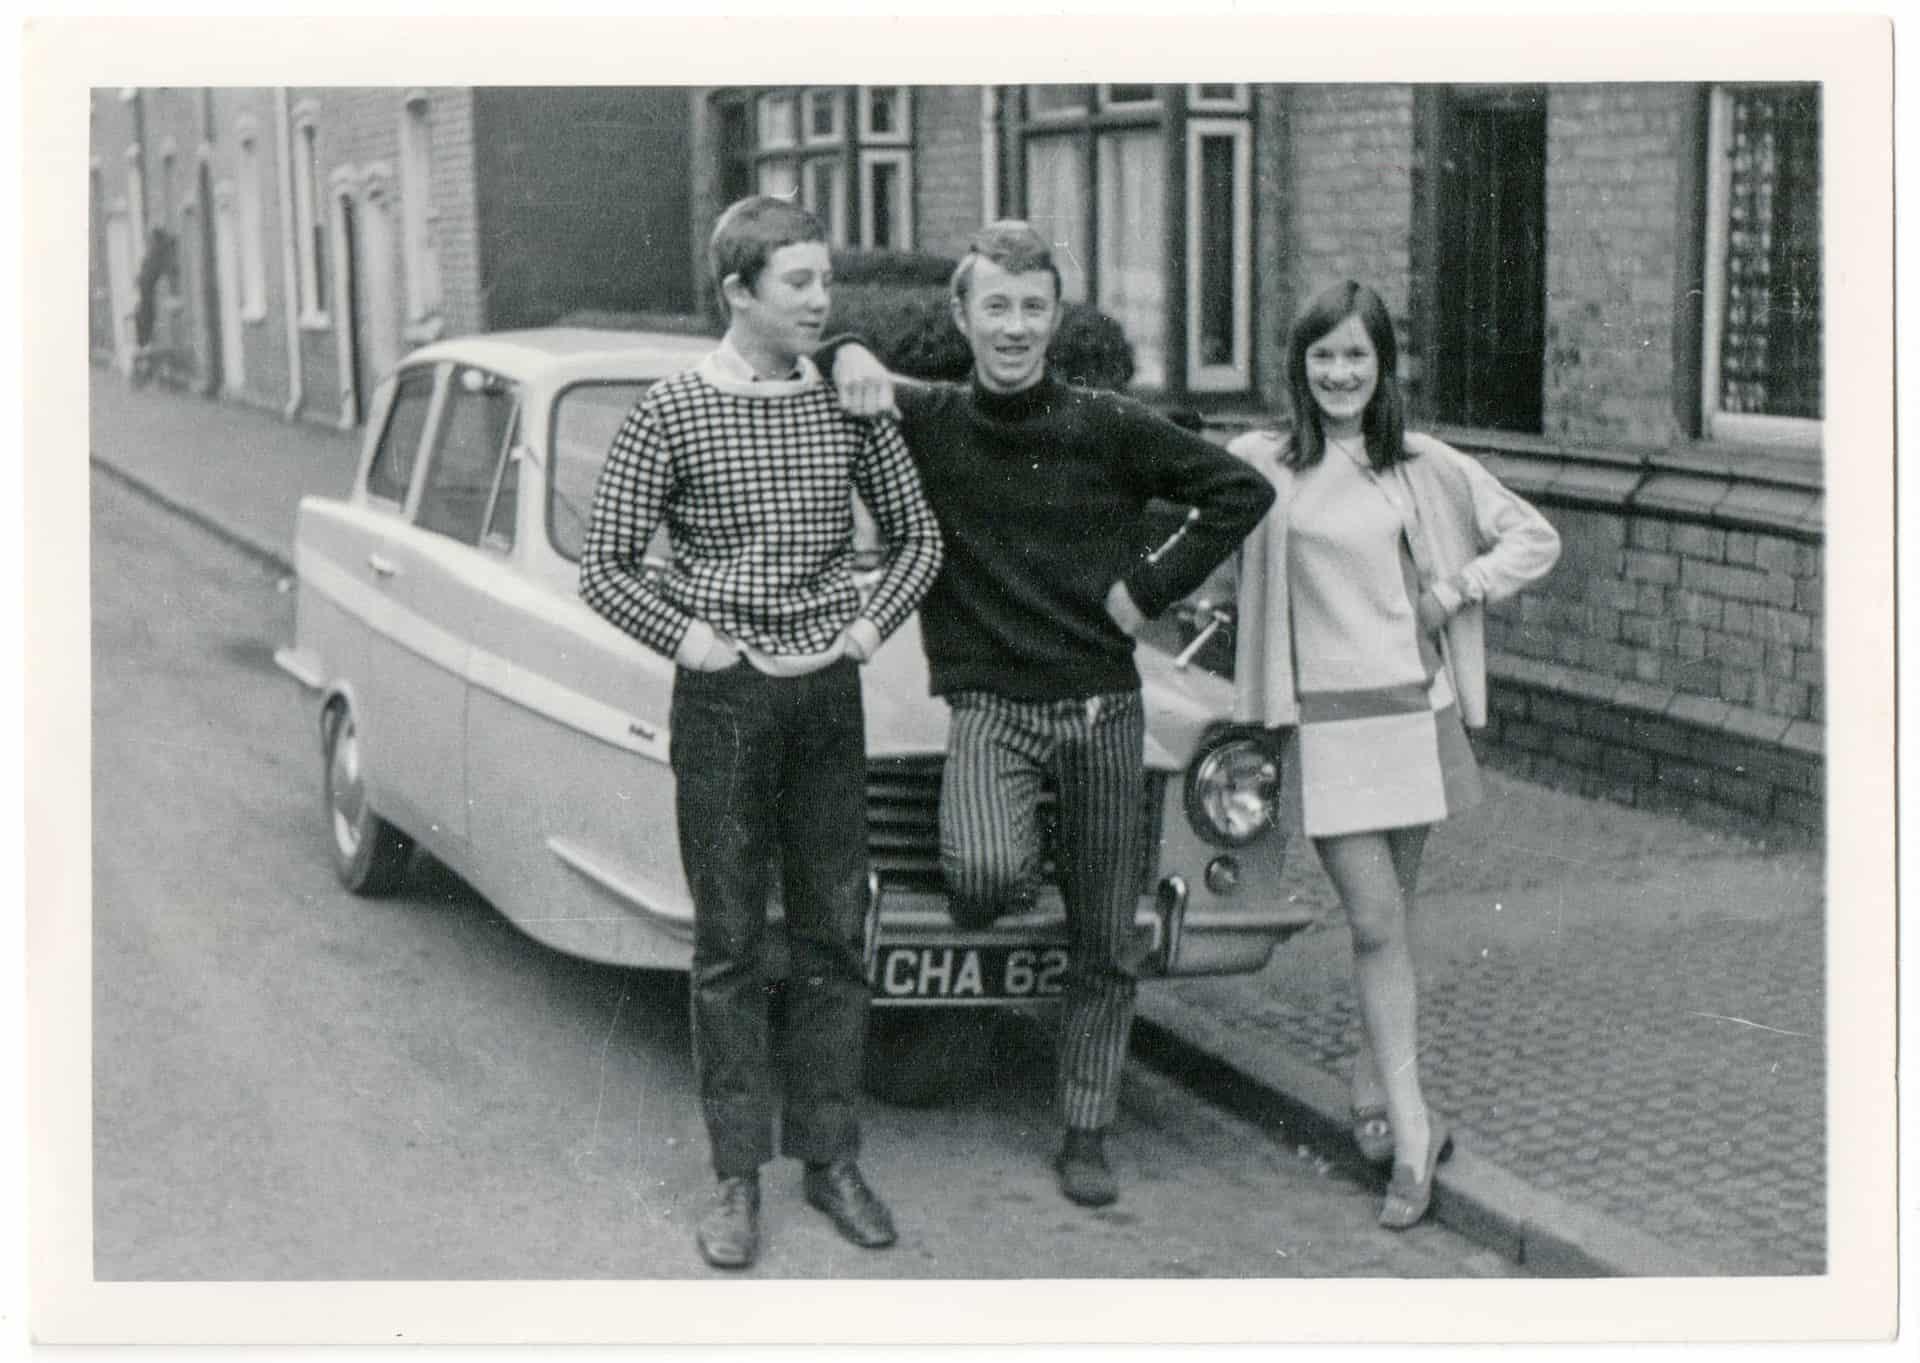 Smethwick, 1967